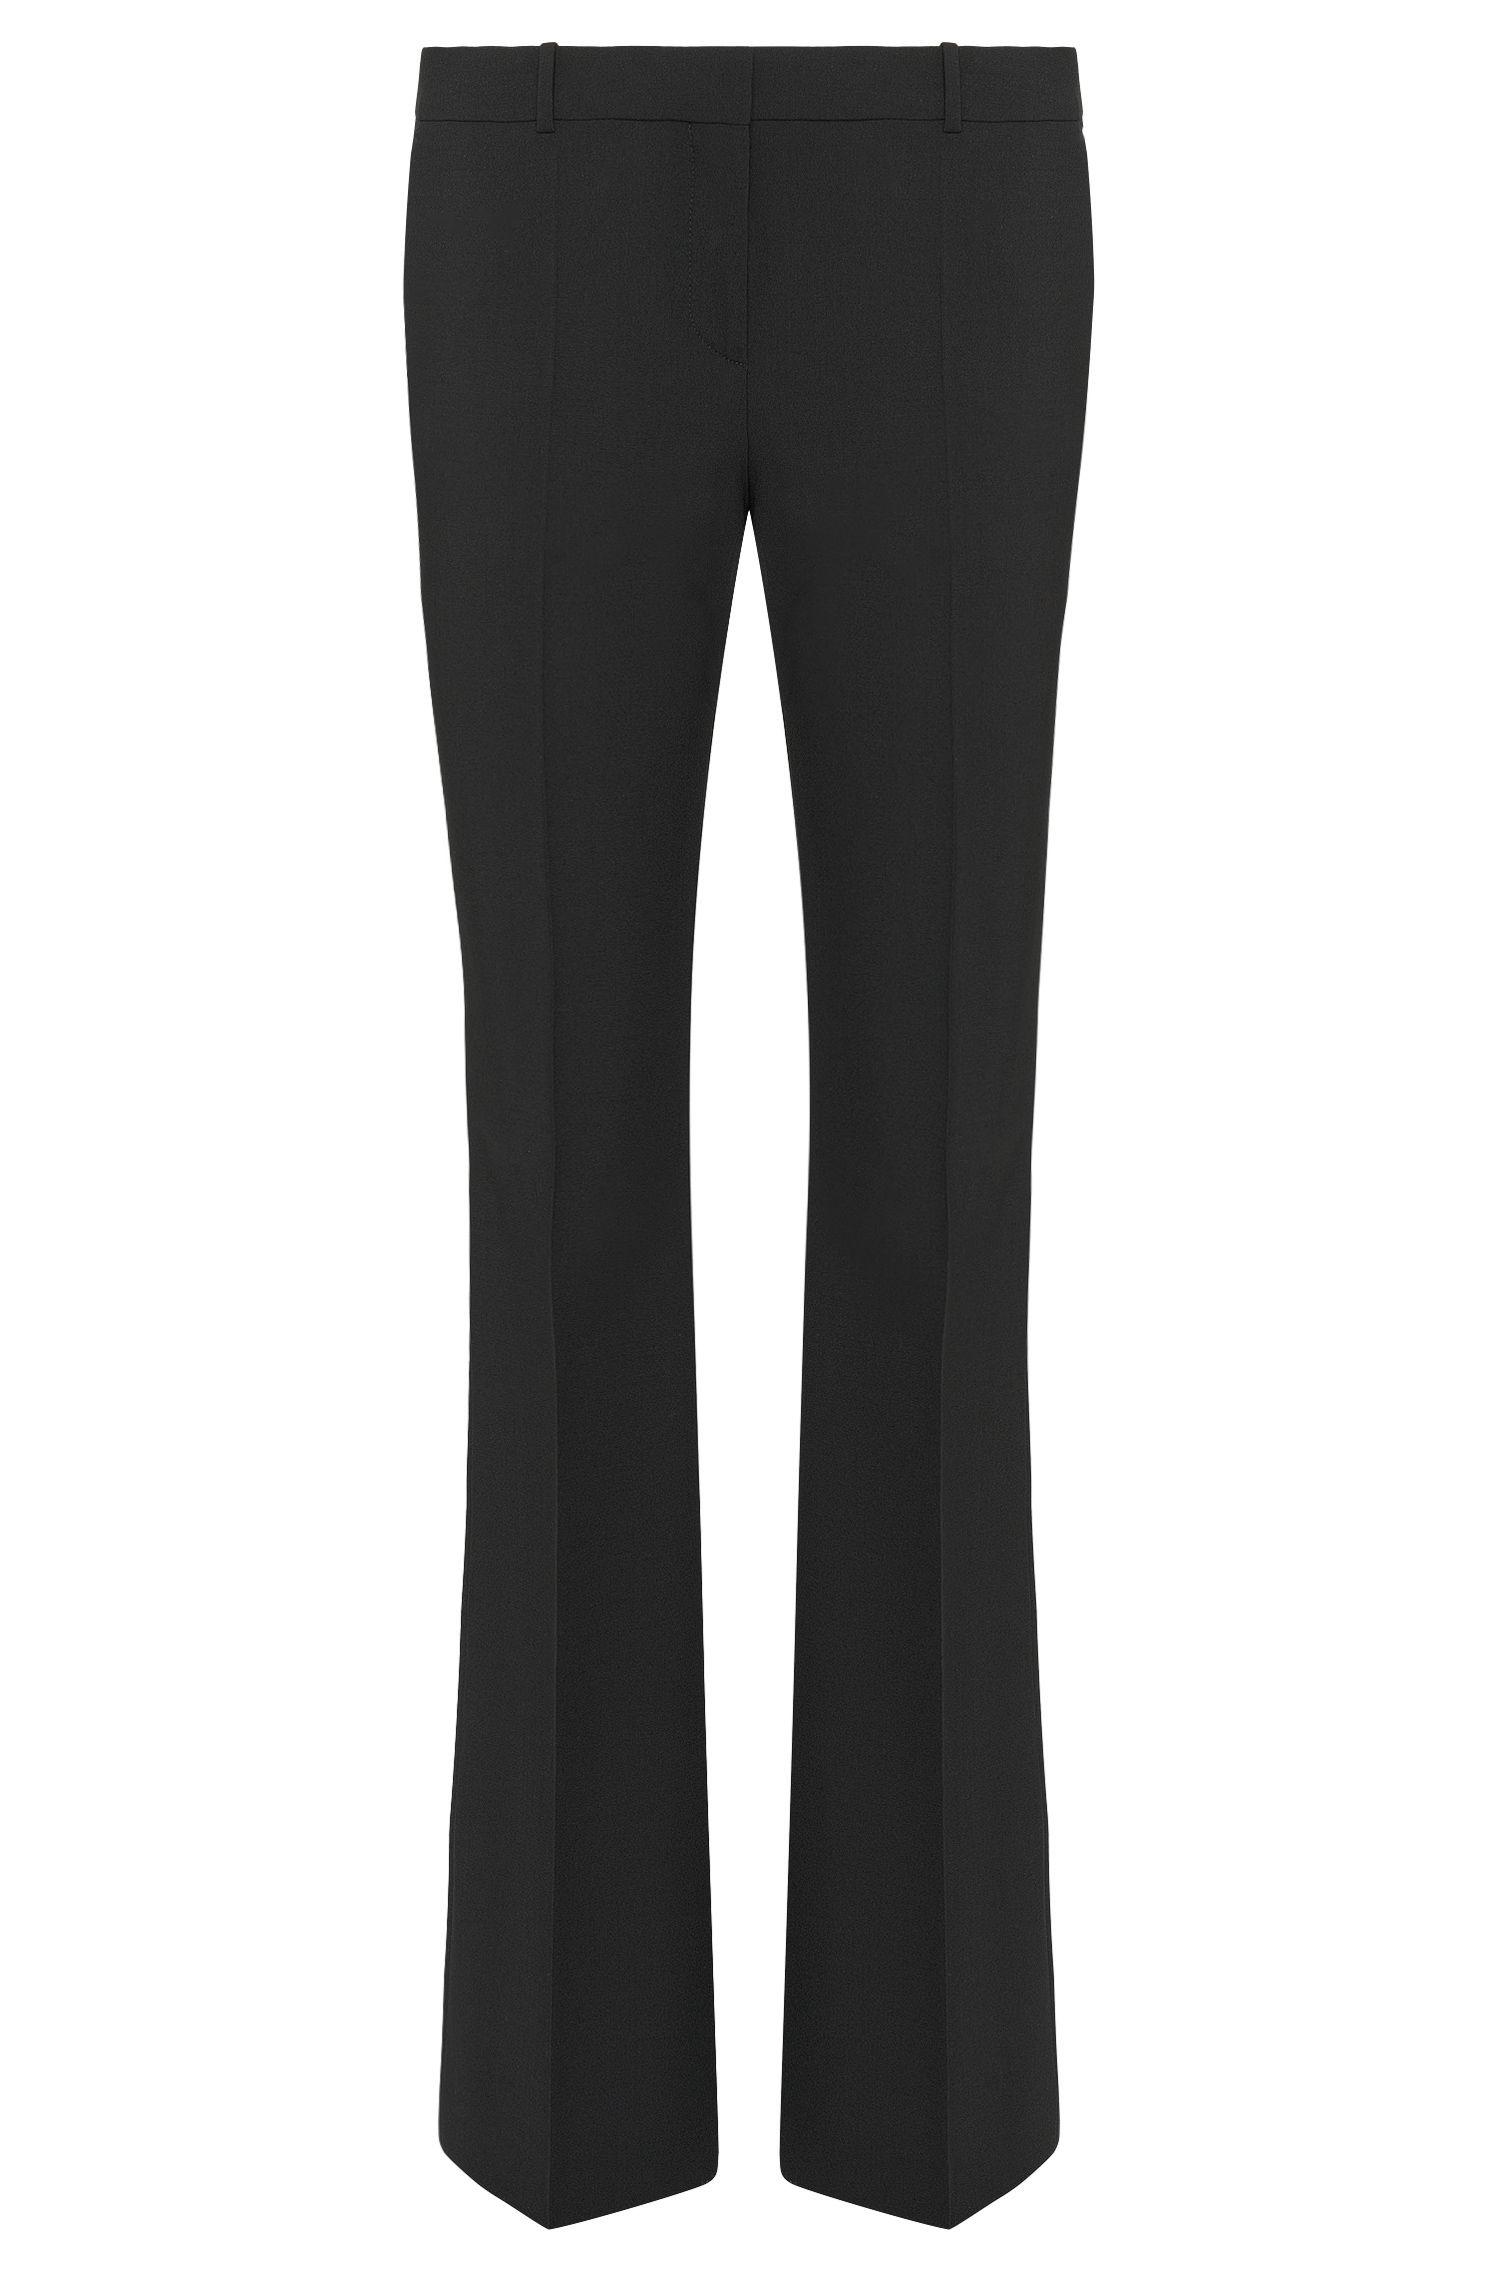 Stretch Virgin Wool Boot Cut Dress Pant | Tulea